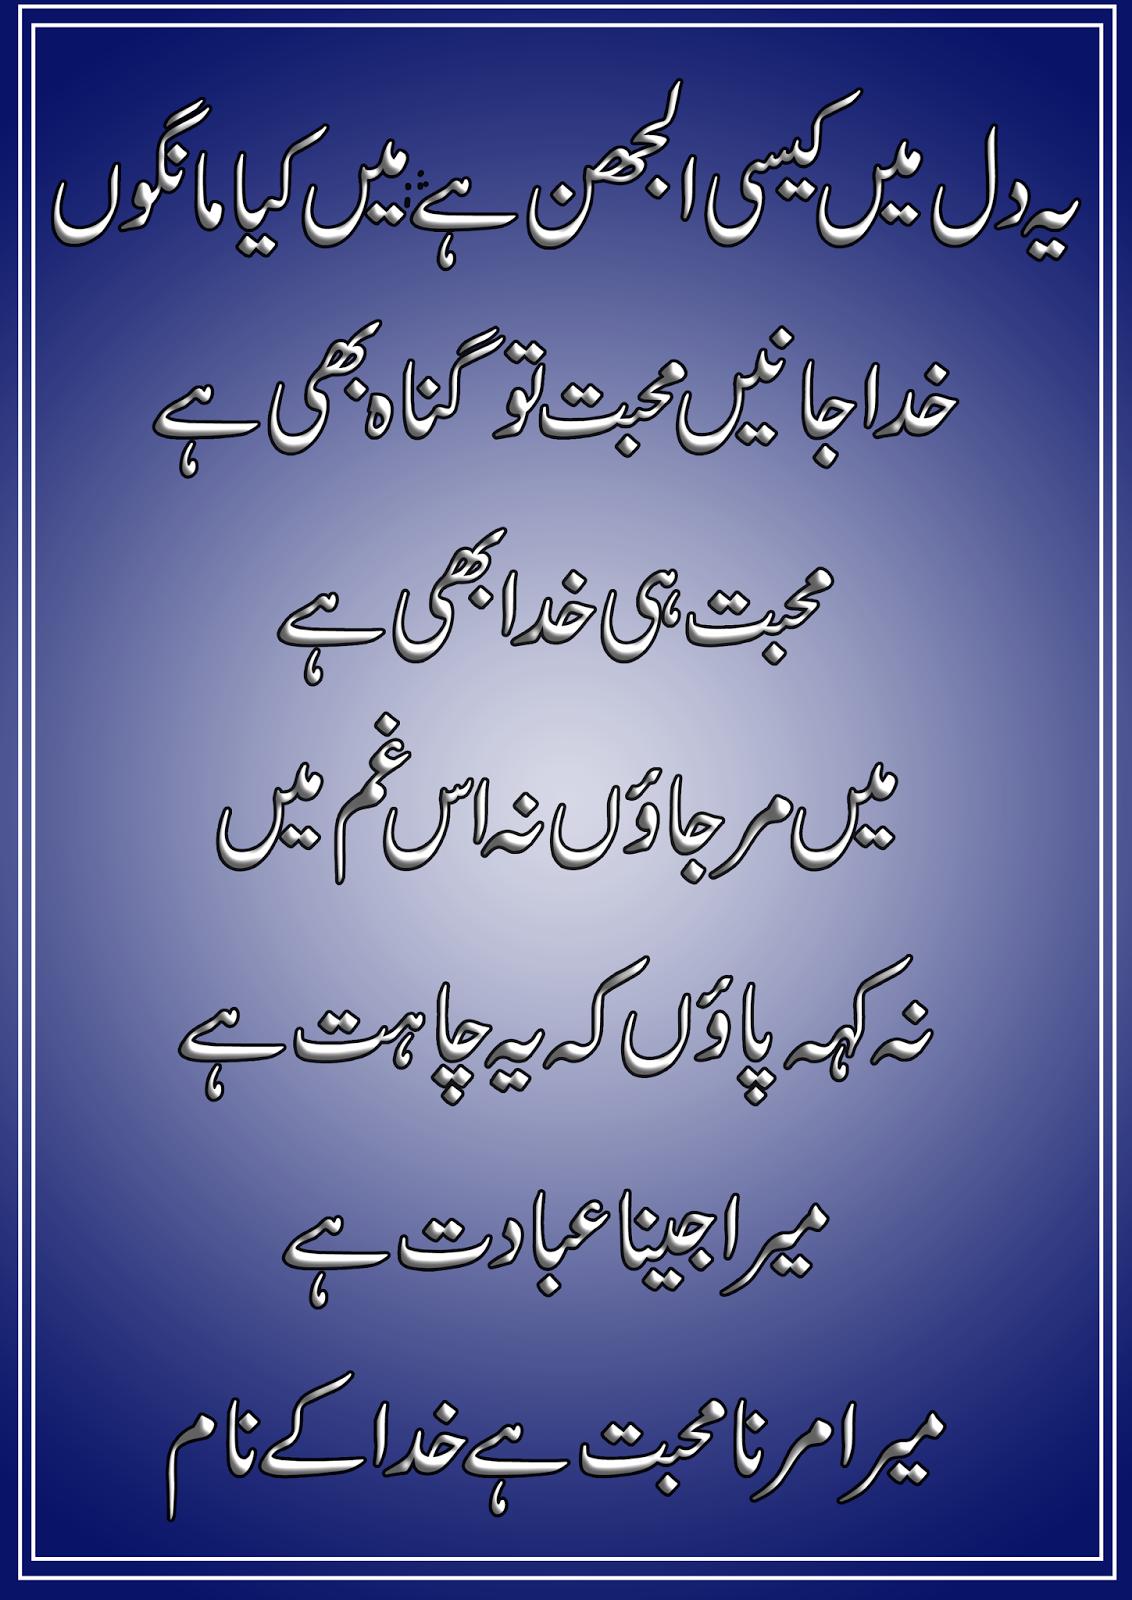 Khuda aur muhabbat Poetry songs